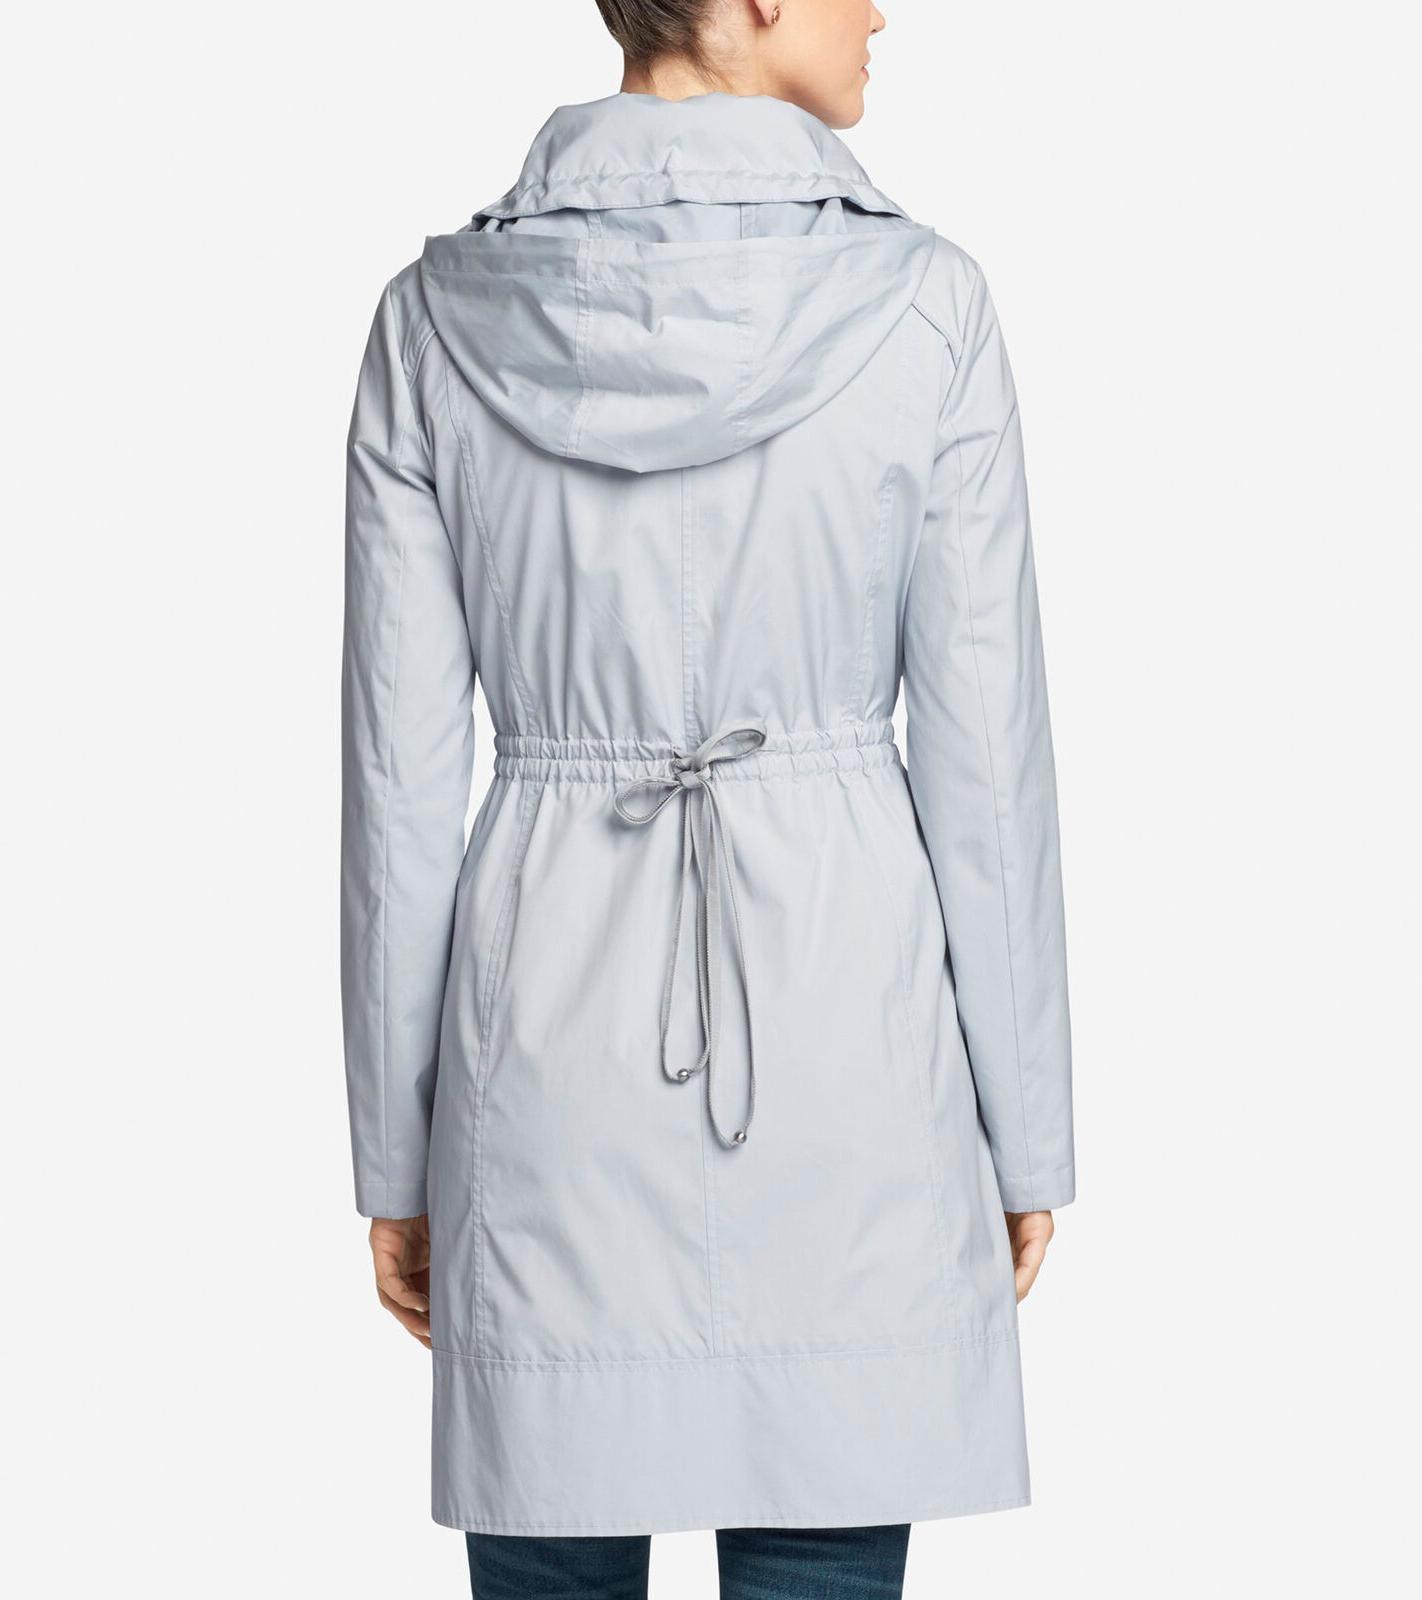 NWT Cole Haan Hooded Jacket